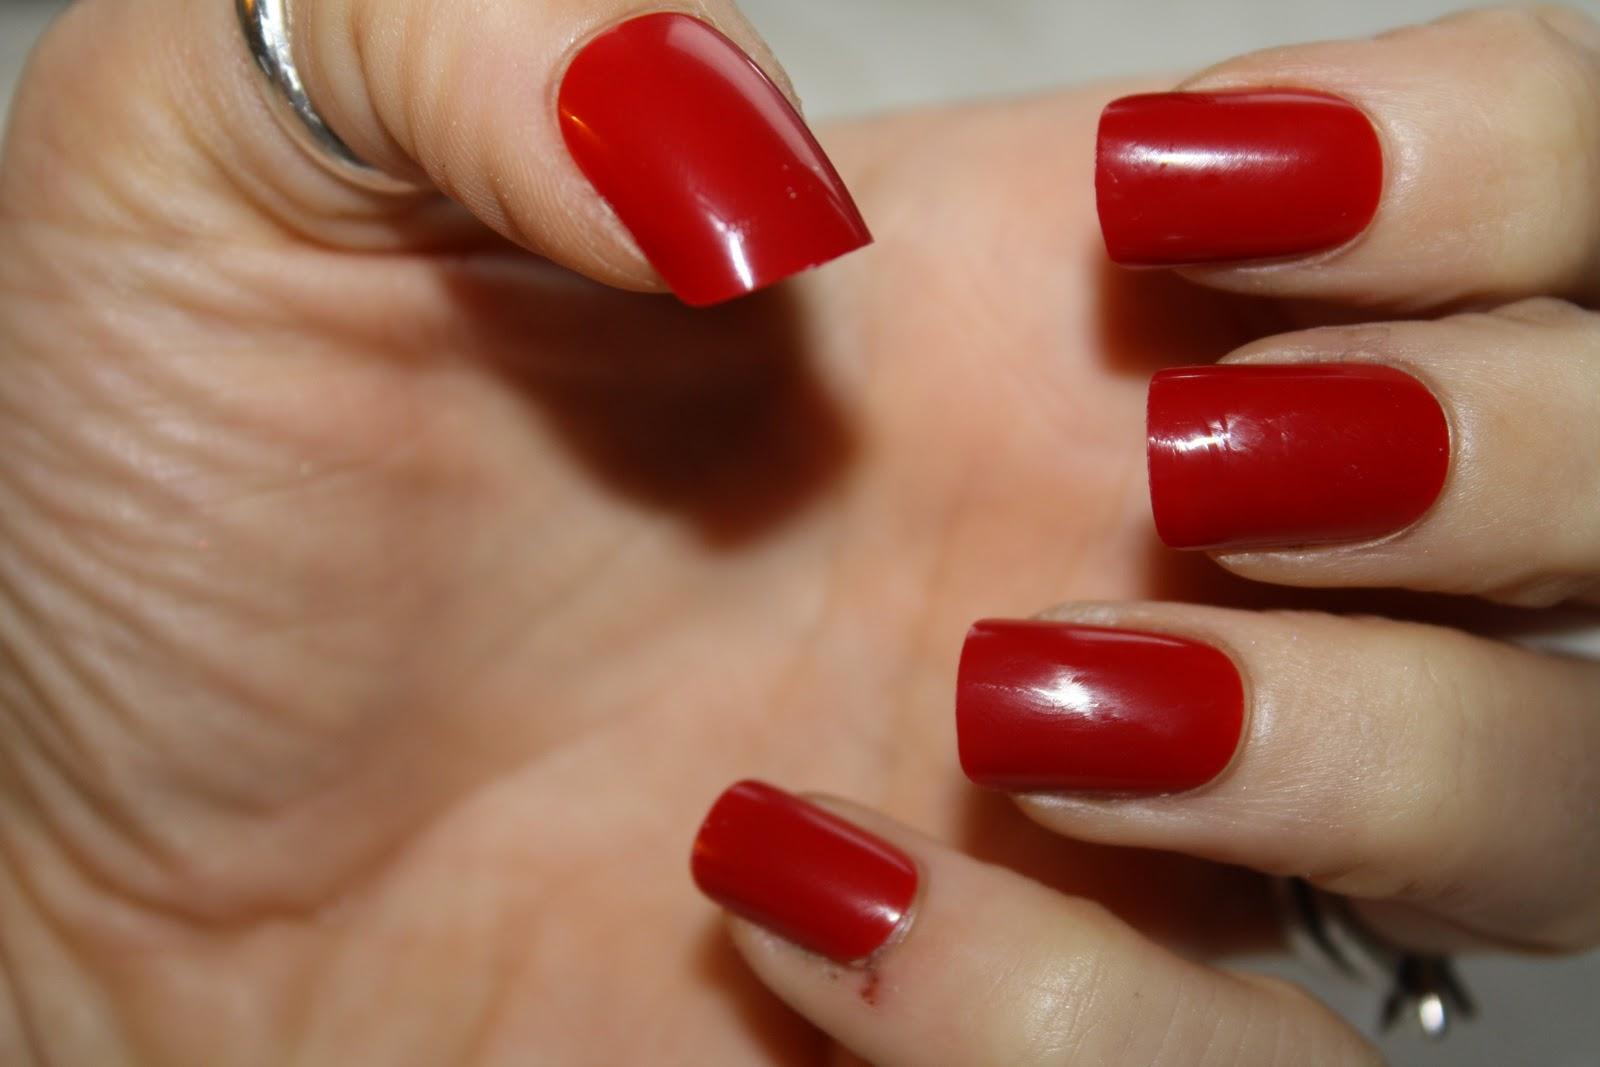 Amazing Red Square Nails Elaboration - Nail Art Ideas - morihati.com